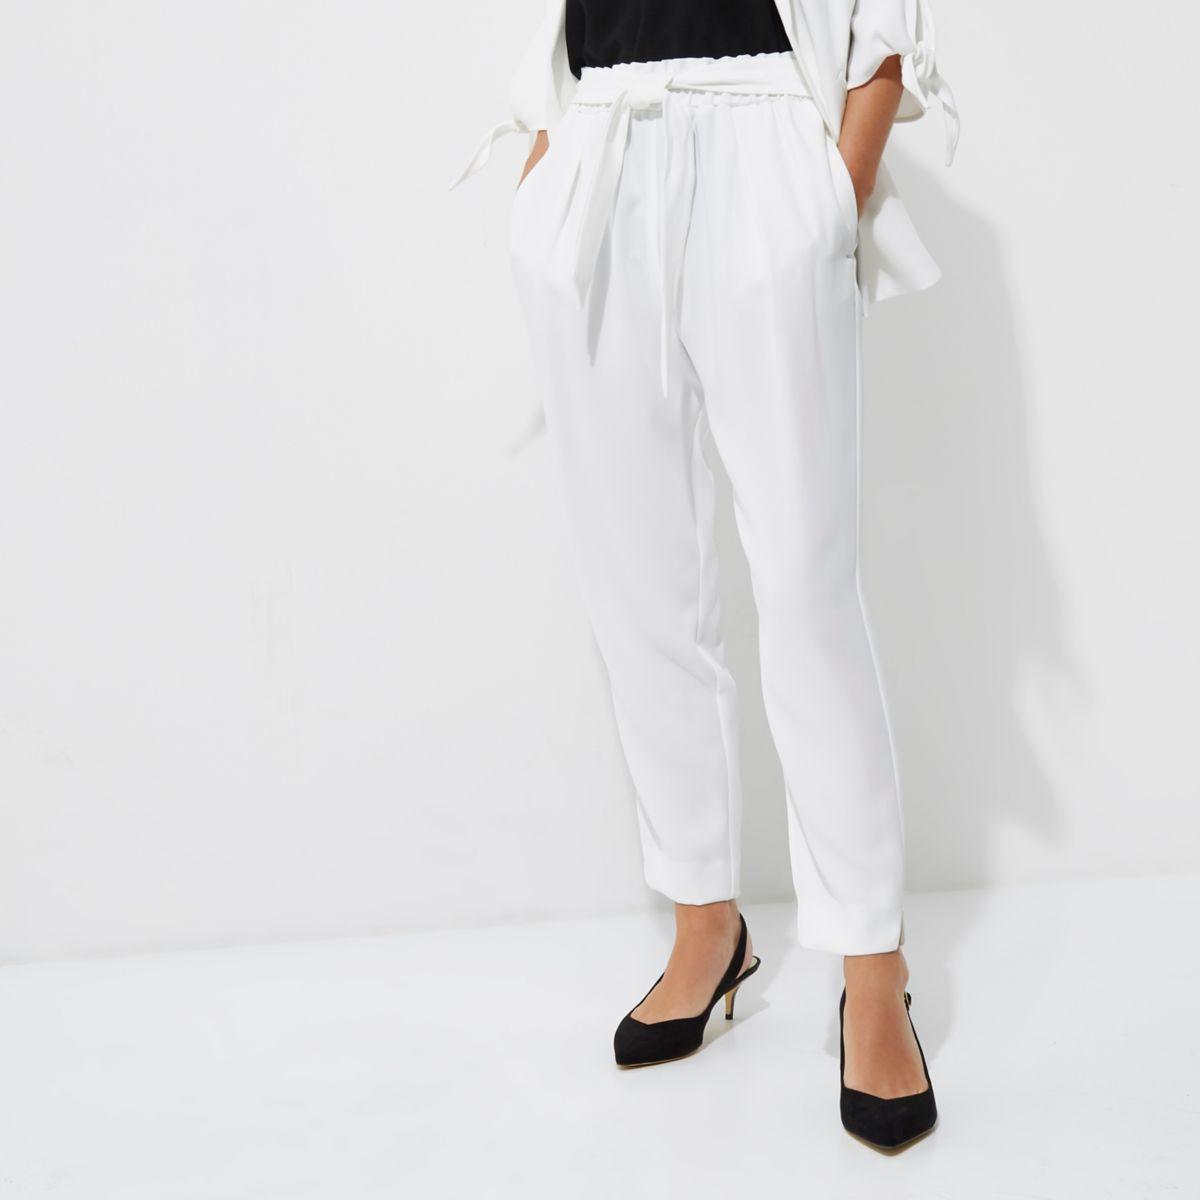 Petite white tapered pants